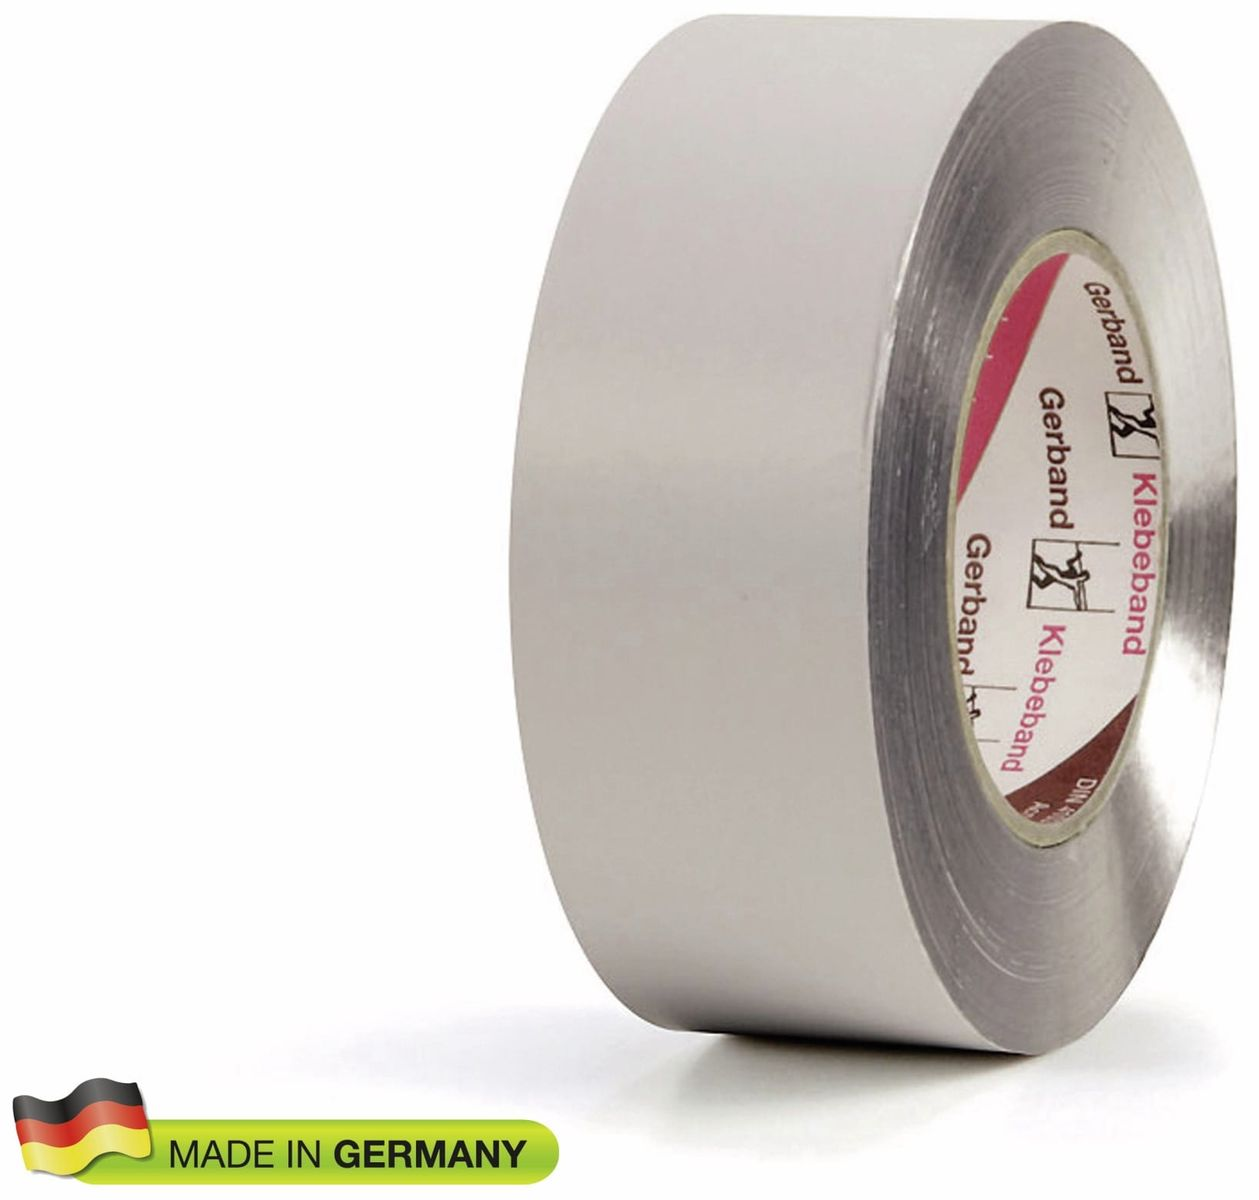 Klebe Band Tape 50mm x 50m 80°C fest weiß 6 x Abklebeband